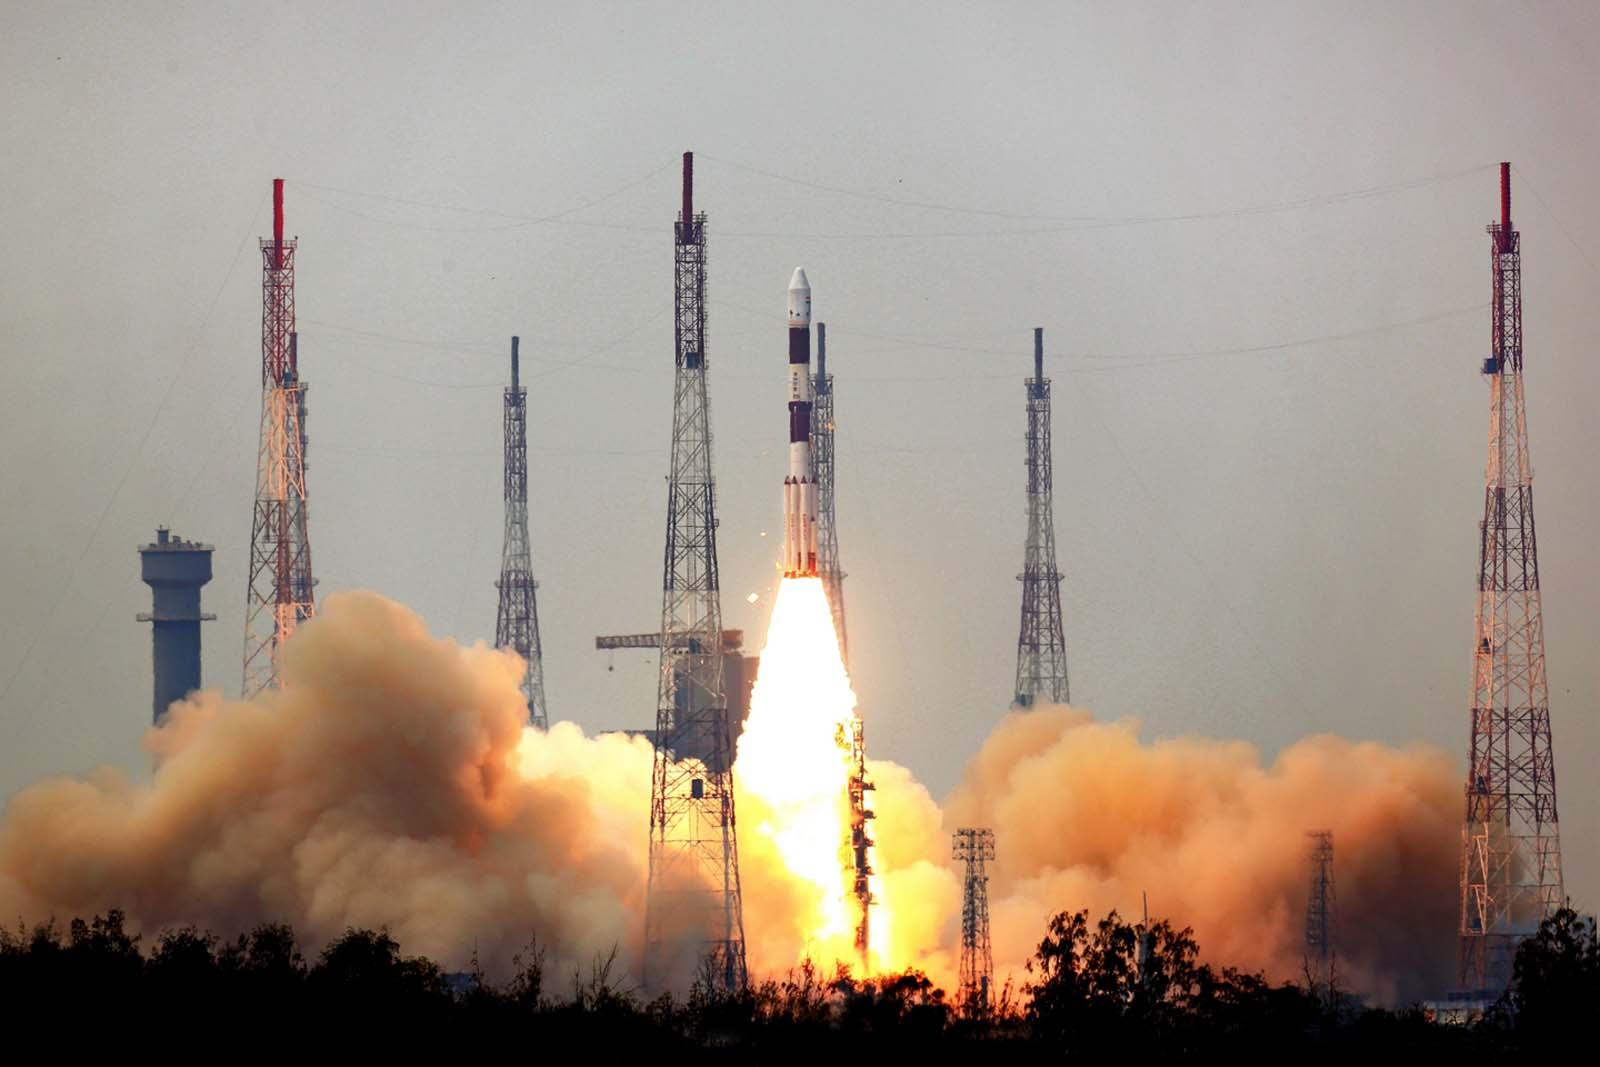 polar satellite launch vehicle The isro's polar satellite launch vehicle carrying indian regional navigation satellite system-irnss-1f blasts off from sriharikota rocket port in andhra pradesh march 10, 2016.